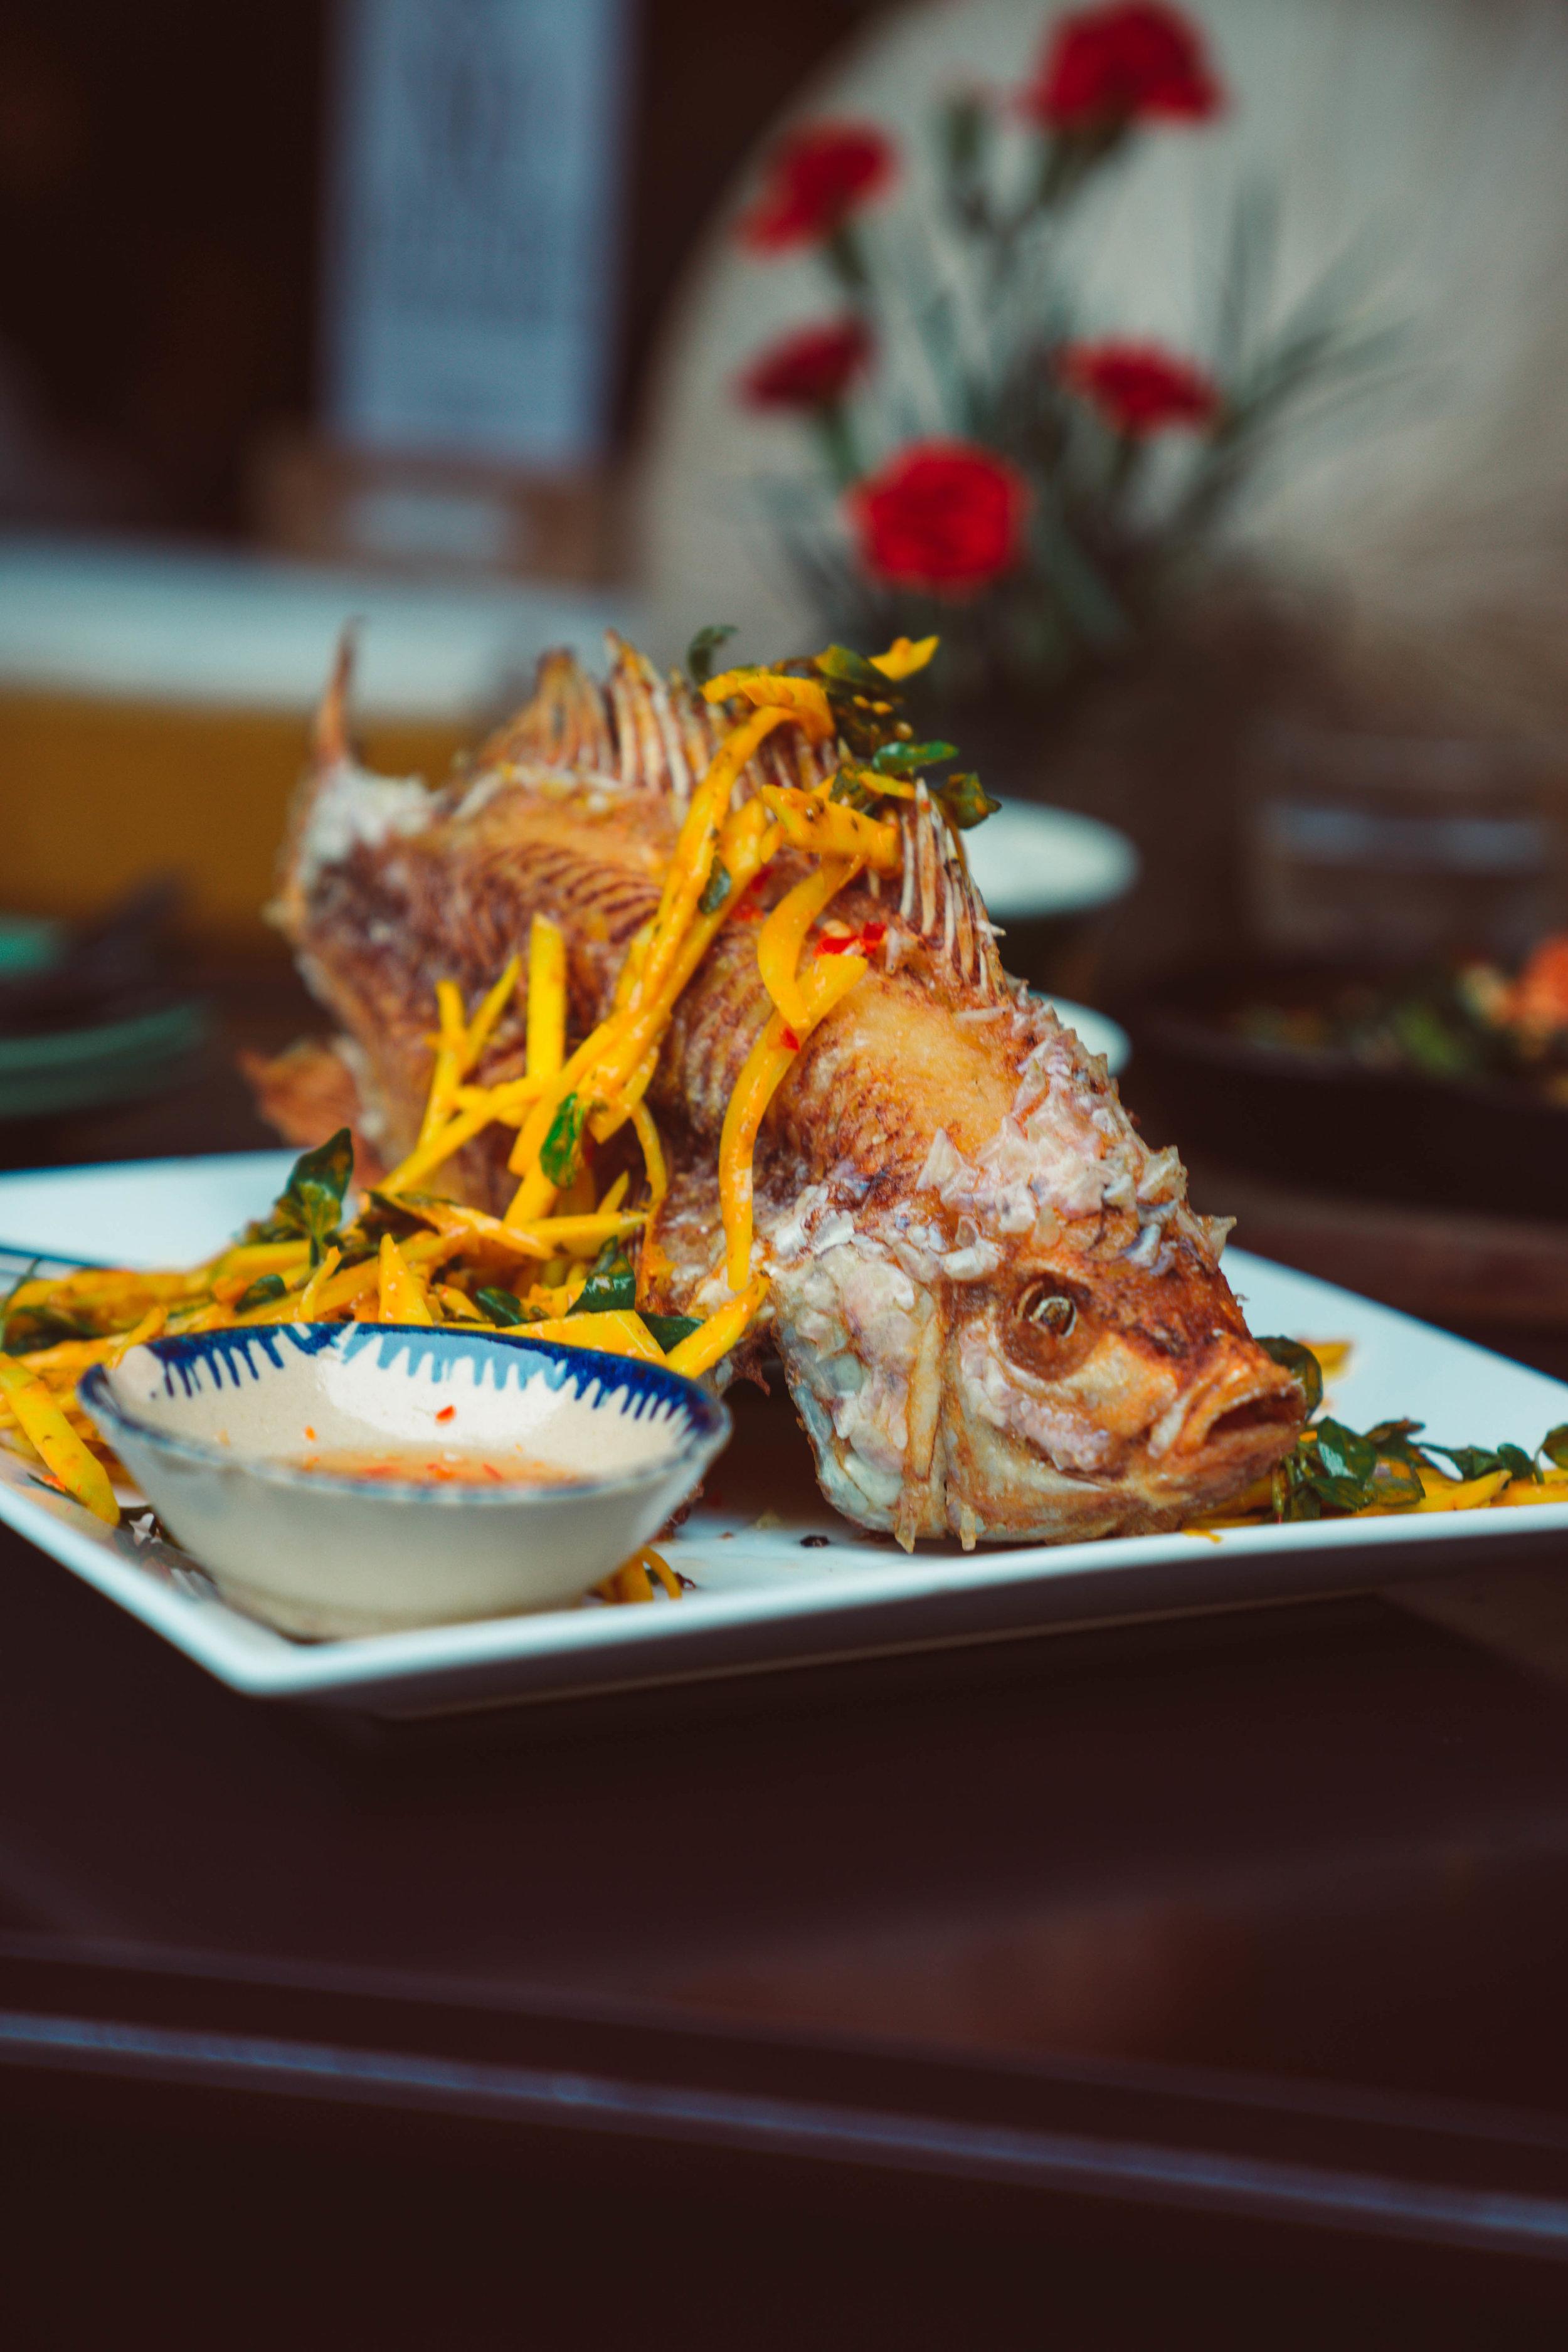 Deep fried elephant ear fish with mango and papaya salad from Morning Glory, Hoi An